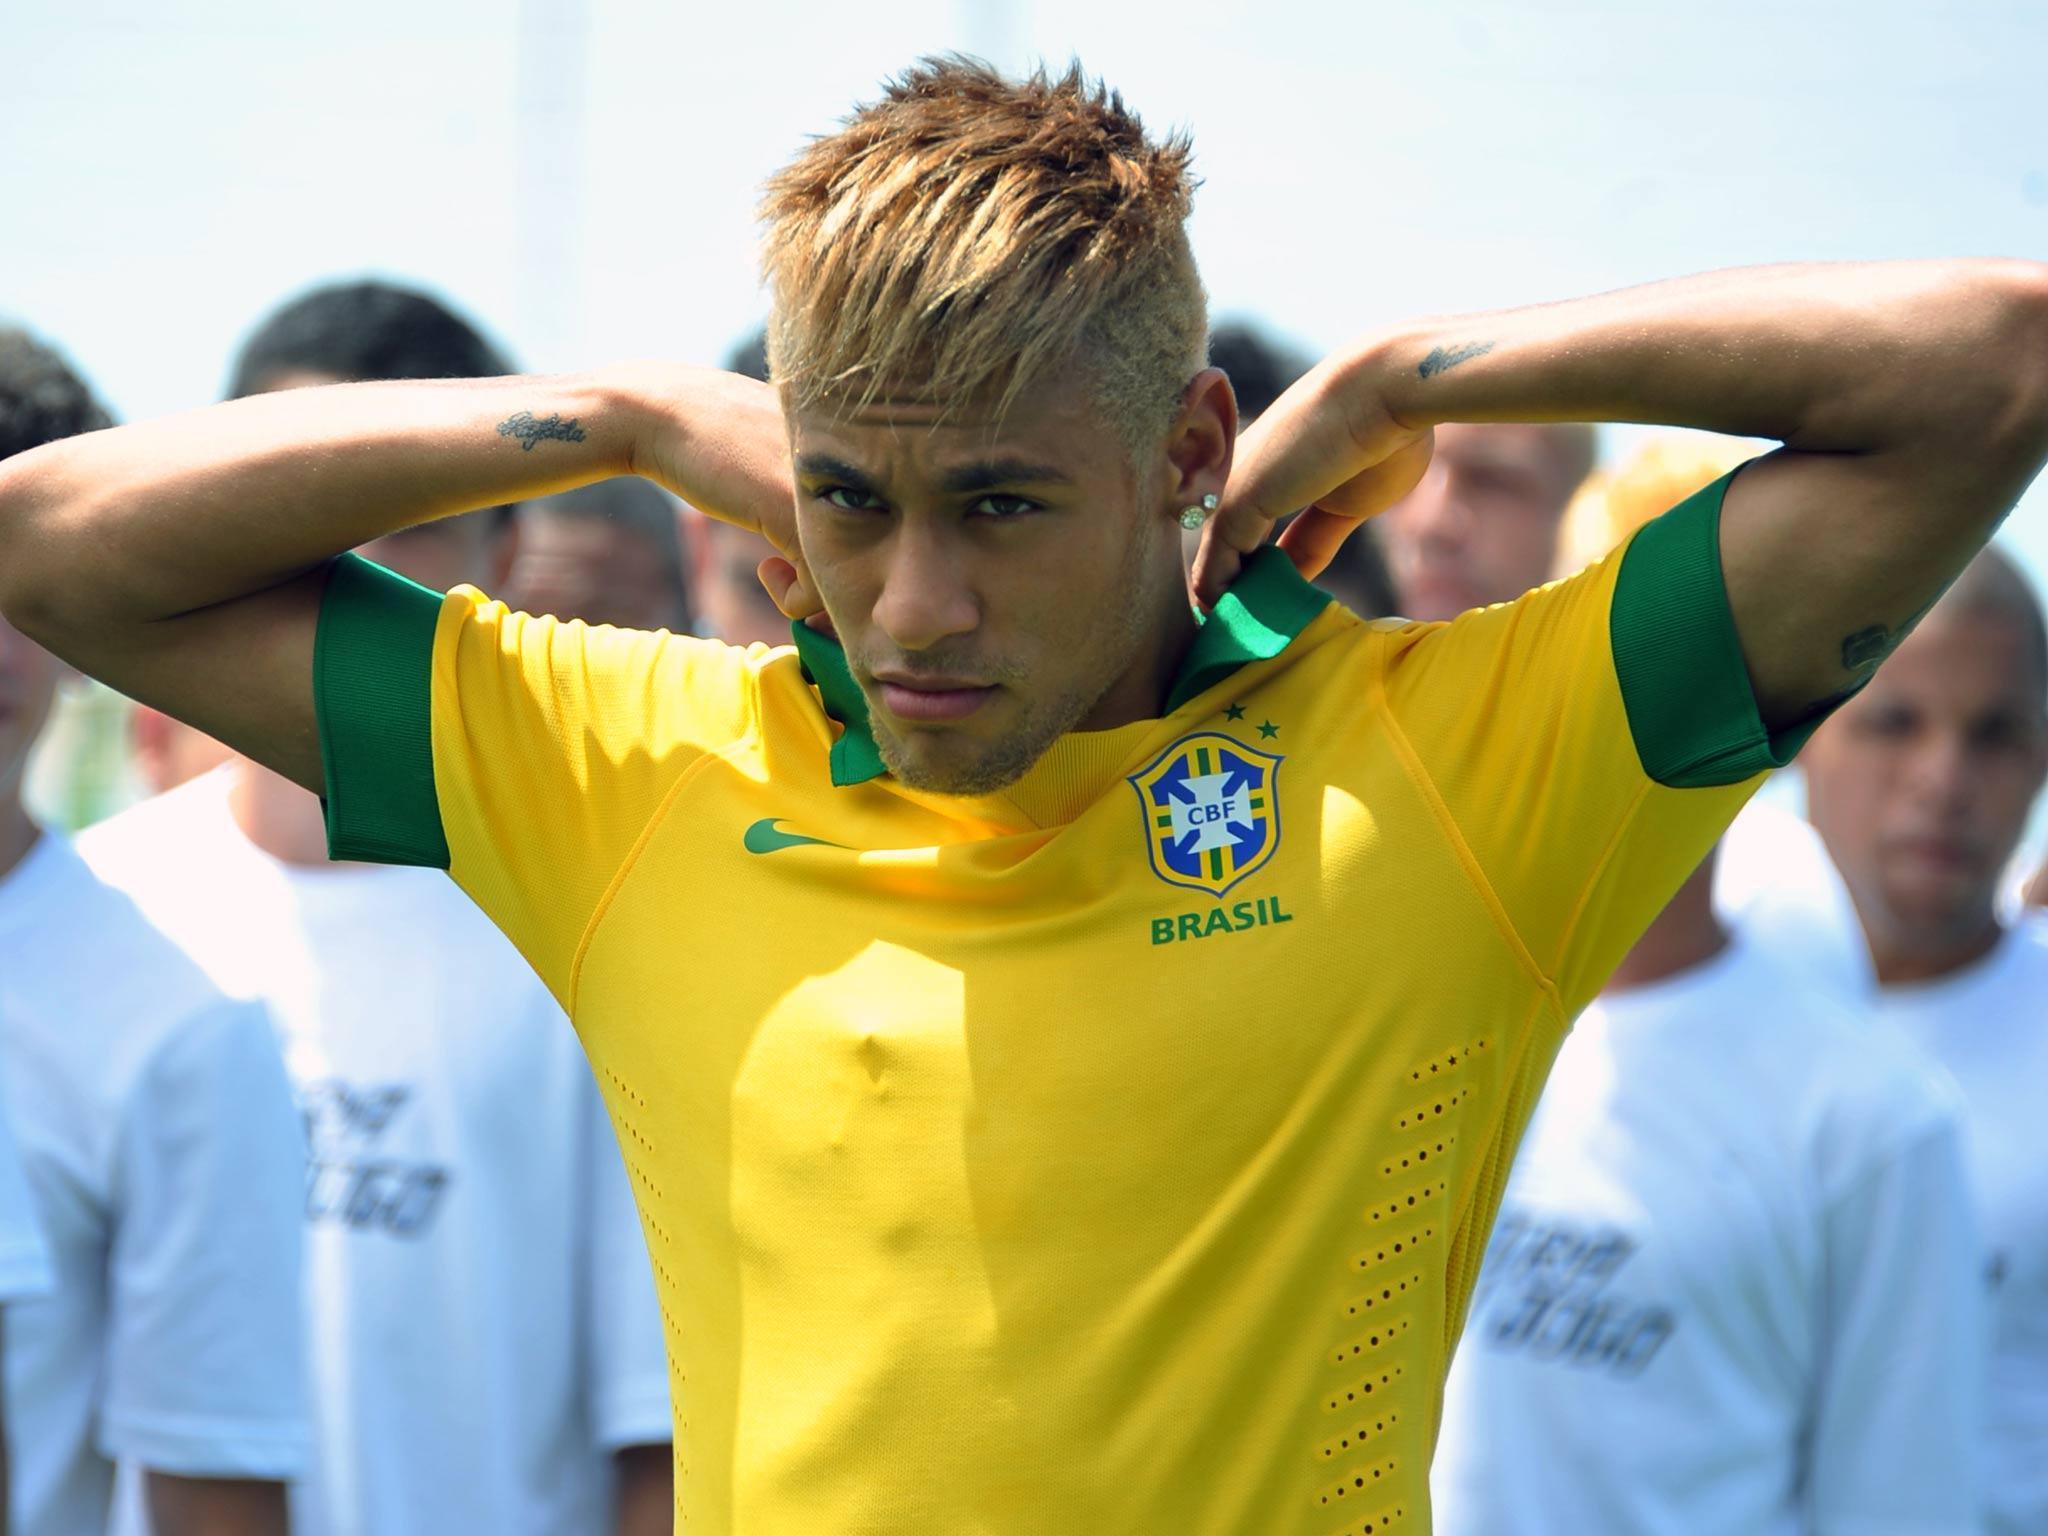 Neymar backgrounds brazil flag 2015 wallpaper cave for Neymar 2014 coupe de cheveux